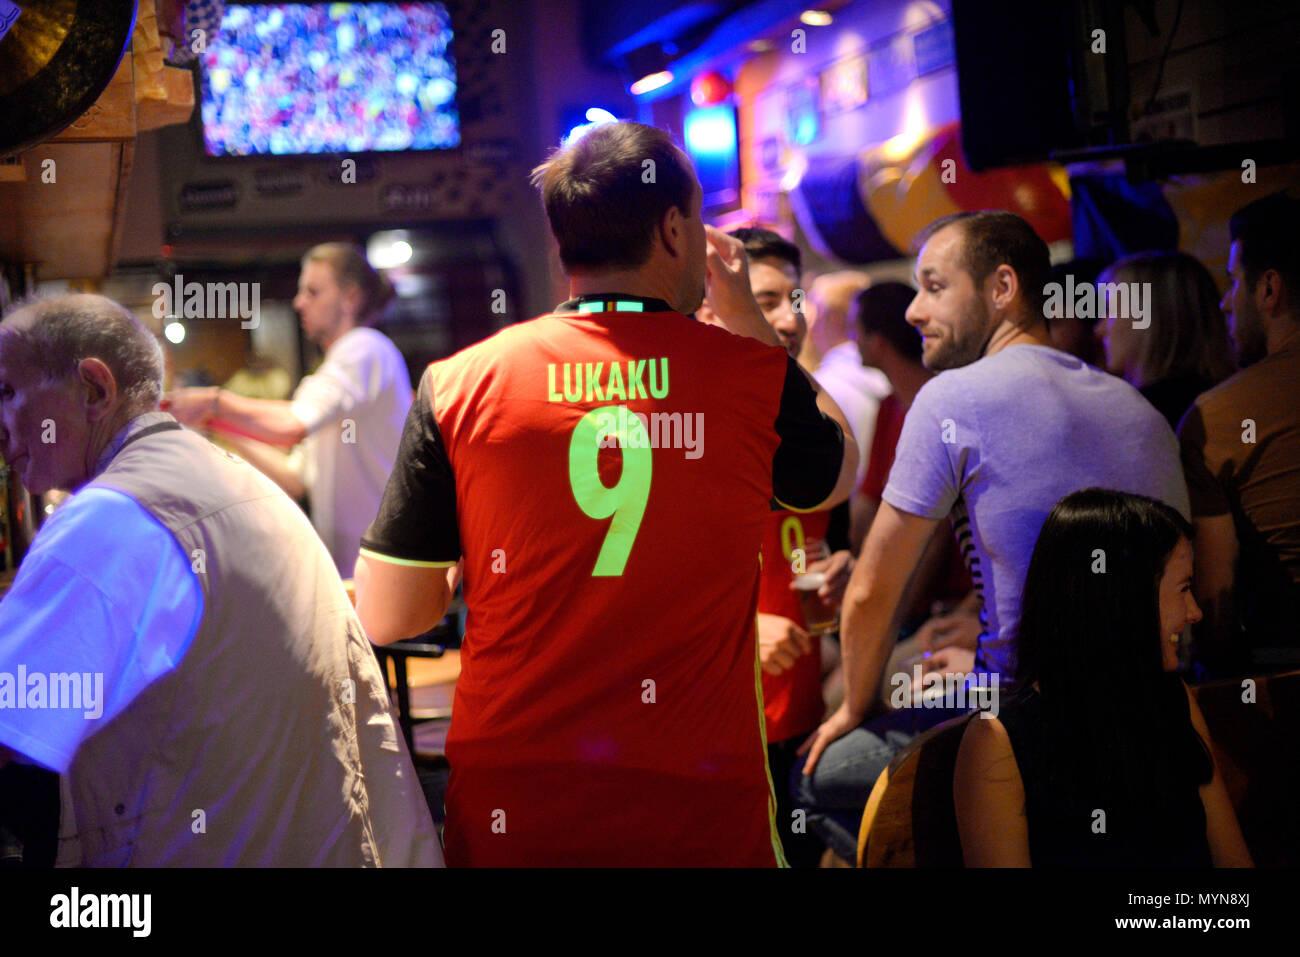 June 2nd, 2018 - Zottegem  Belgian football fans - Stock Image